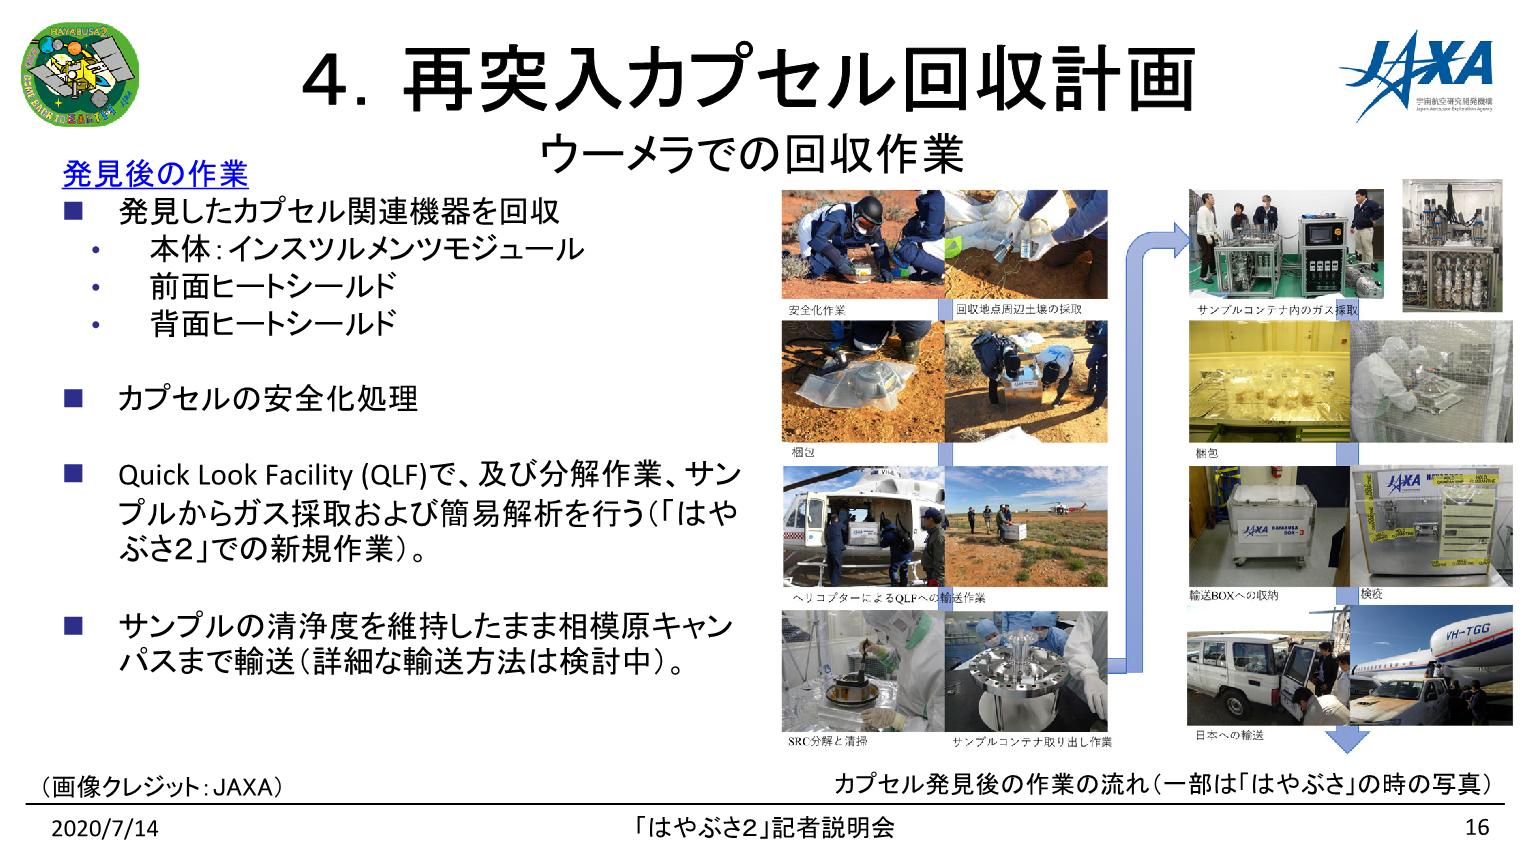 f:id:Imamura:20200812173729p:plain